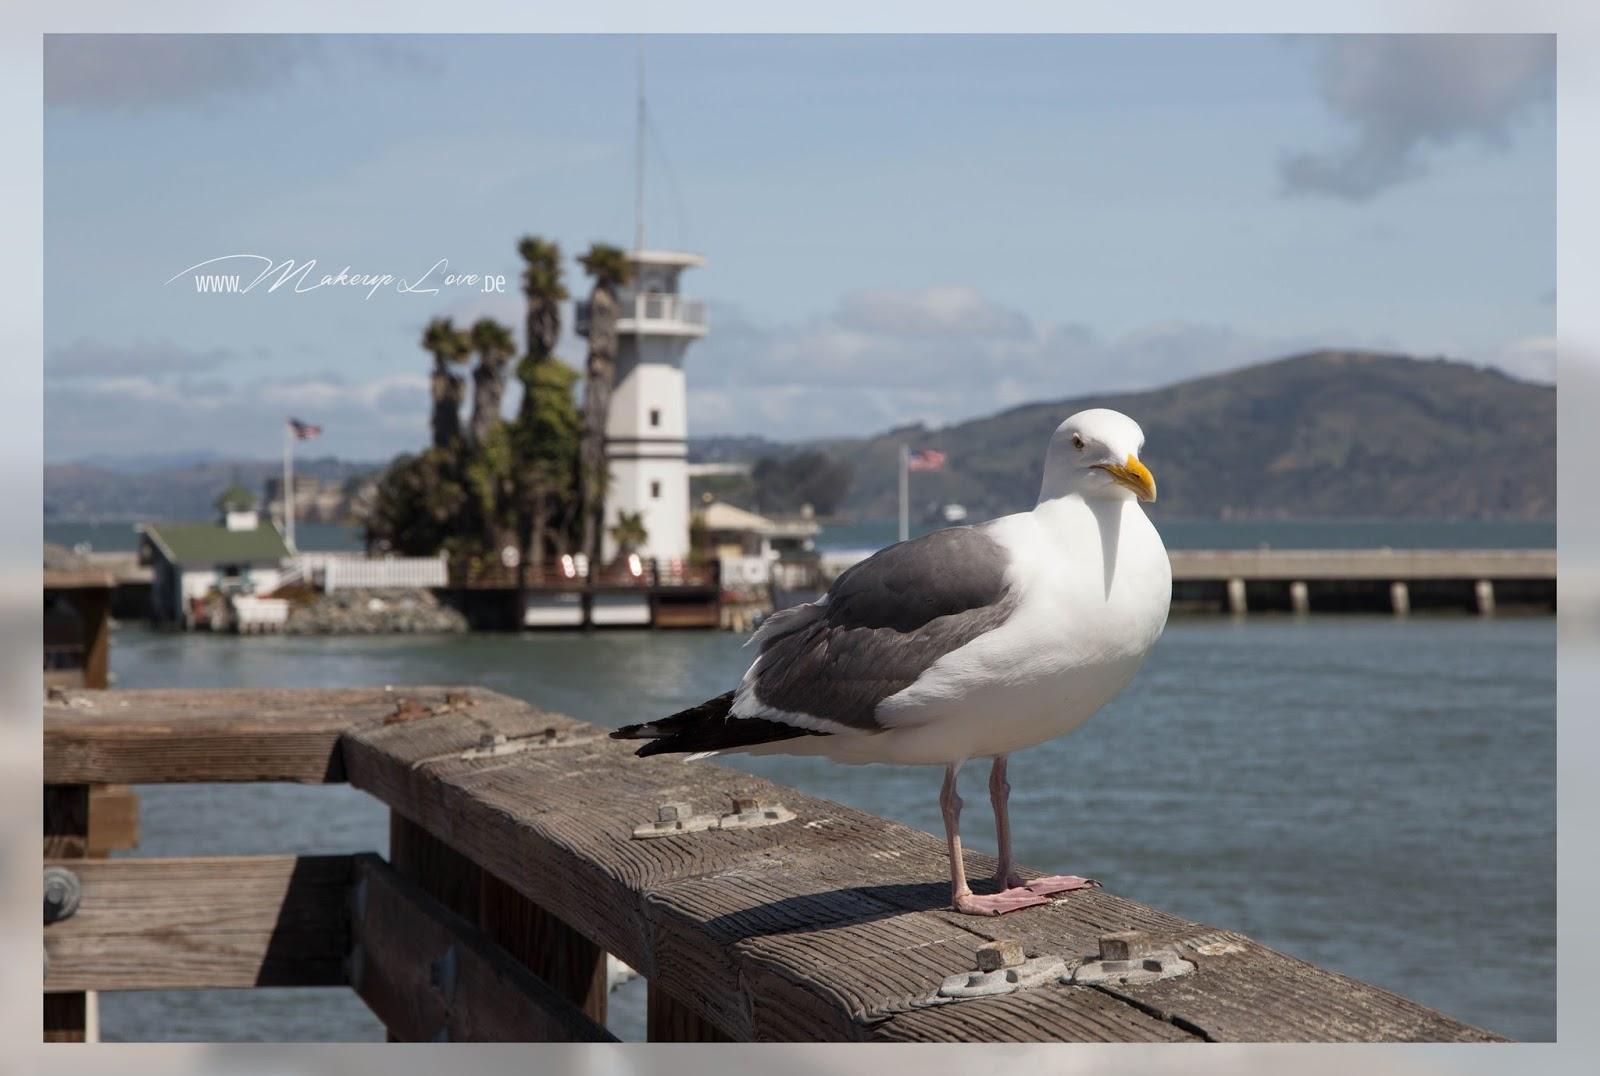 San Francisco Pier 39 Möwe